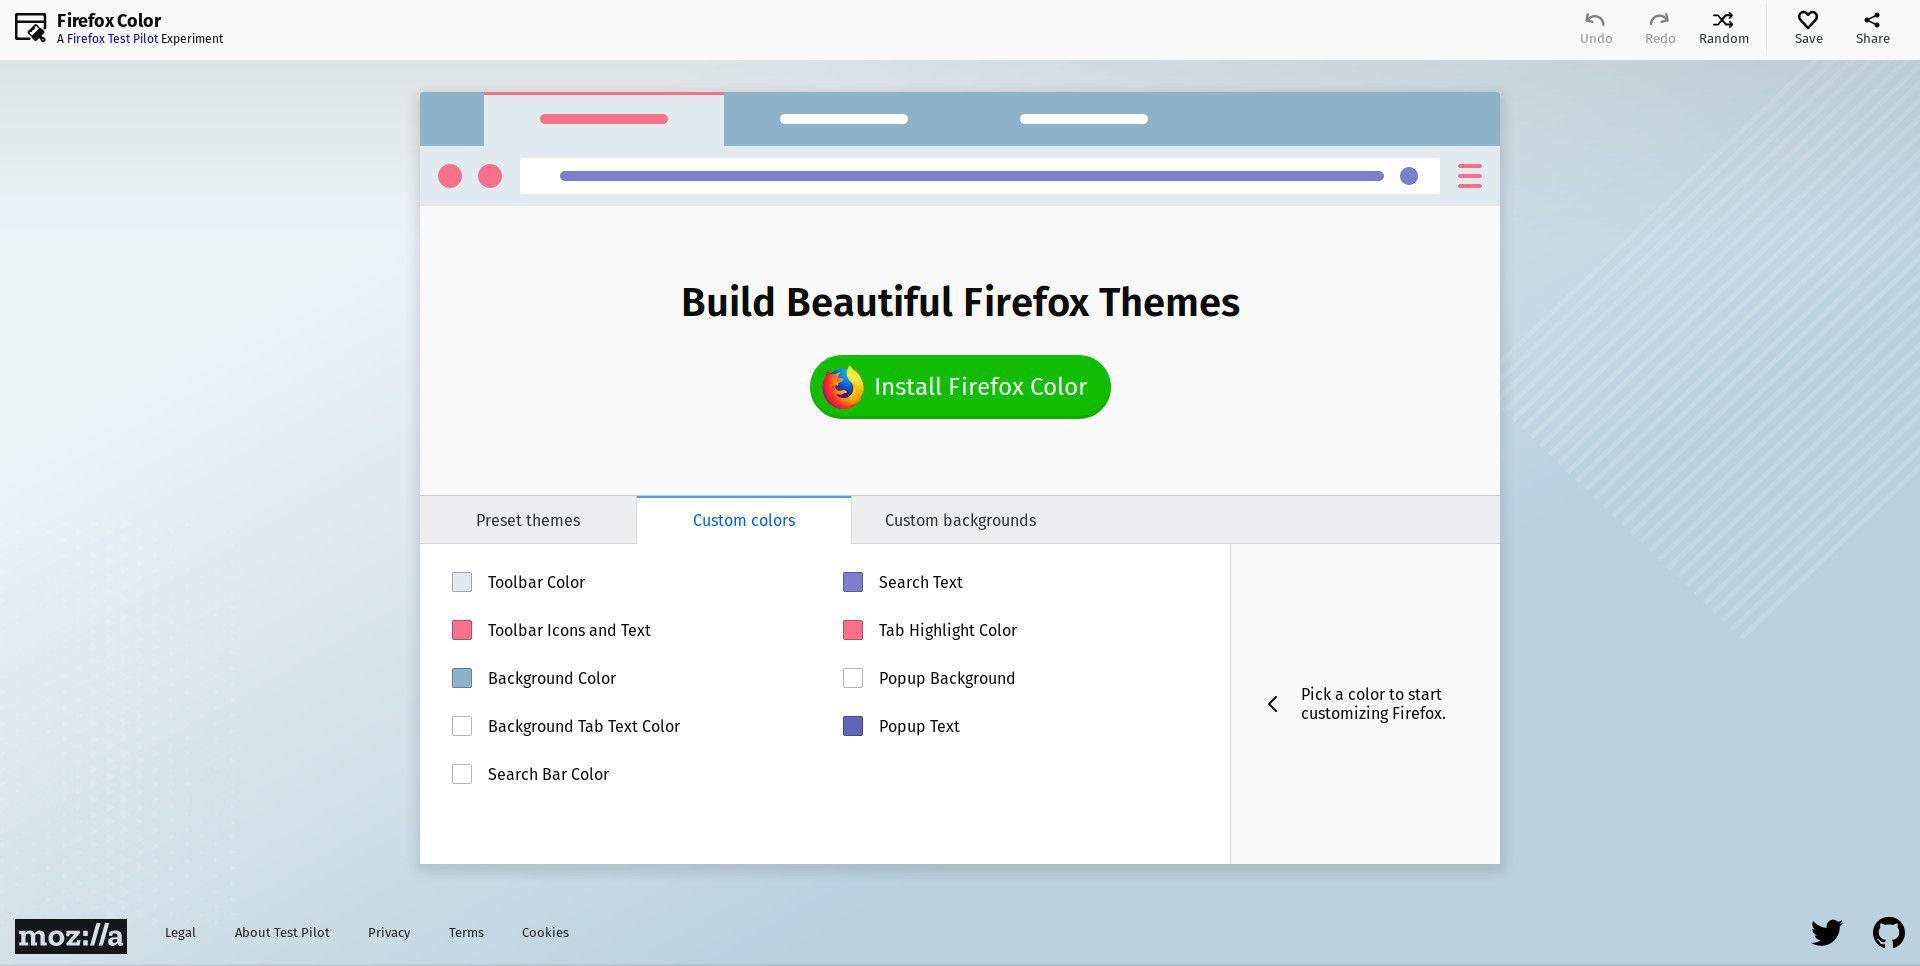 Firefox Color website.